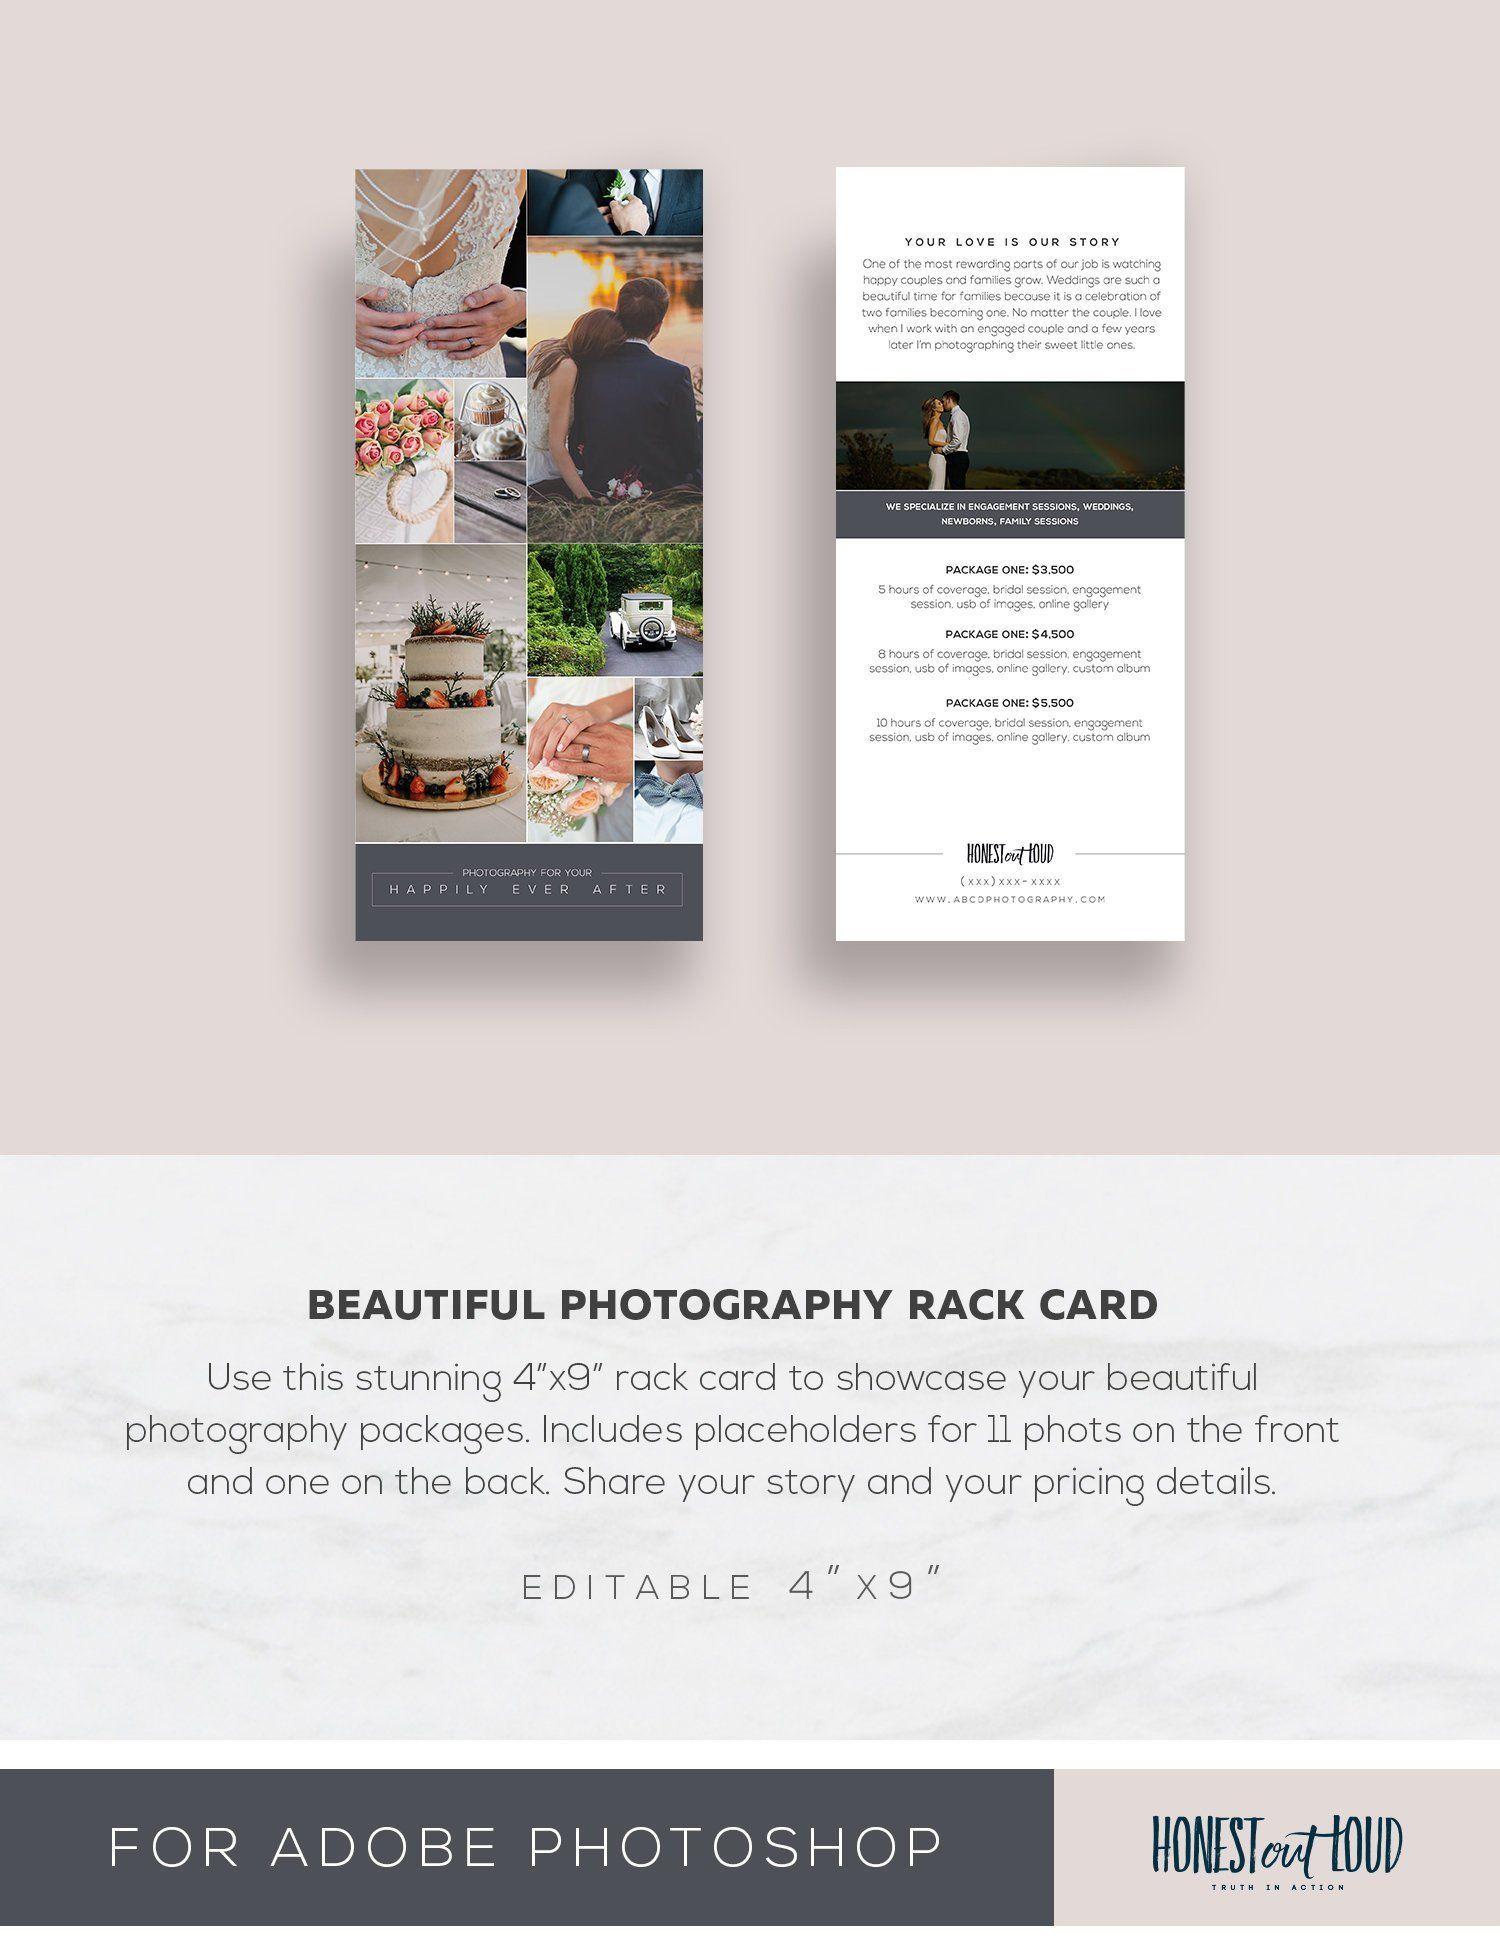 Wedding Photography Rack Card Template 4x9 Photoshop